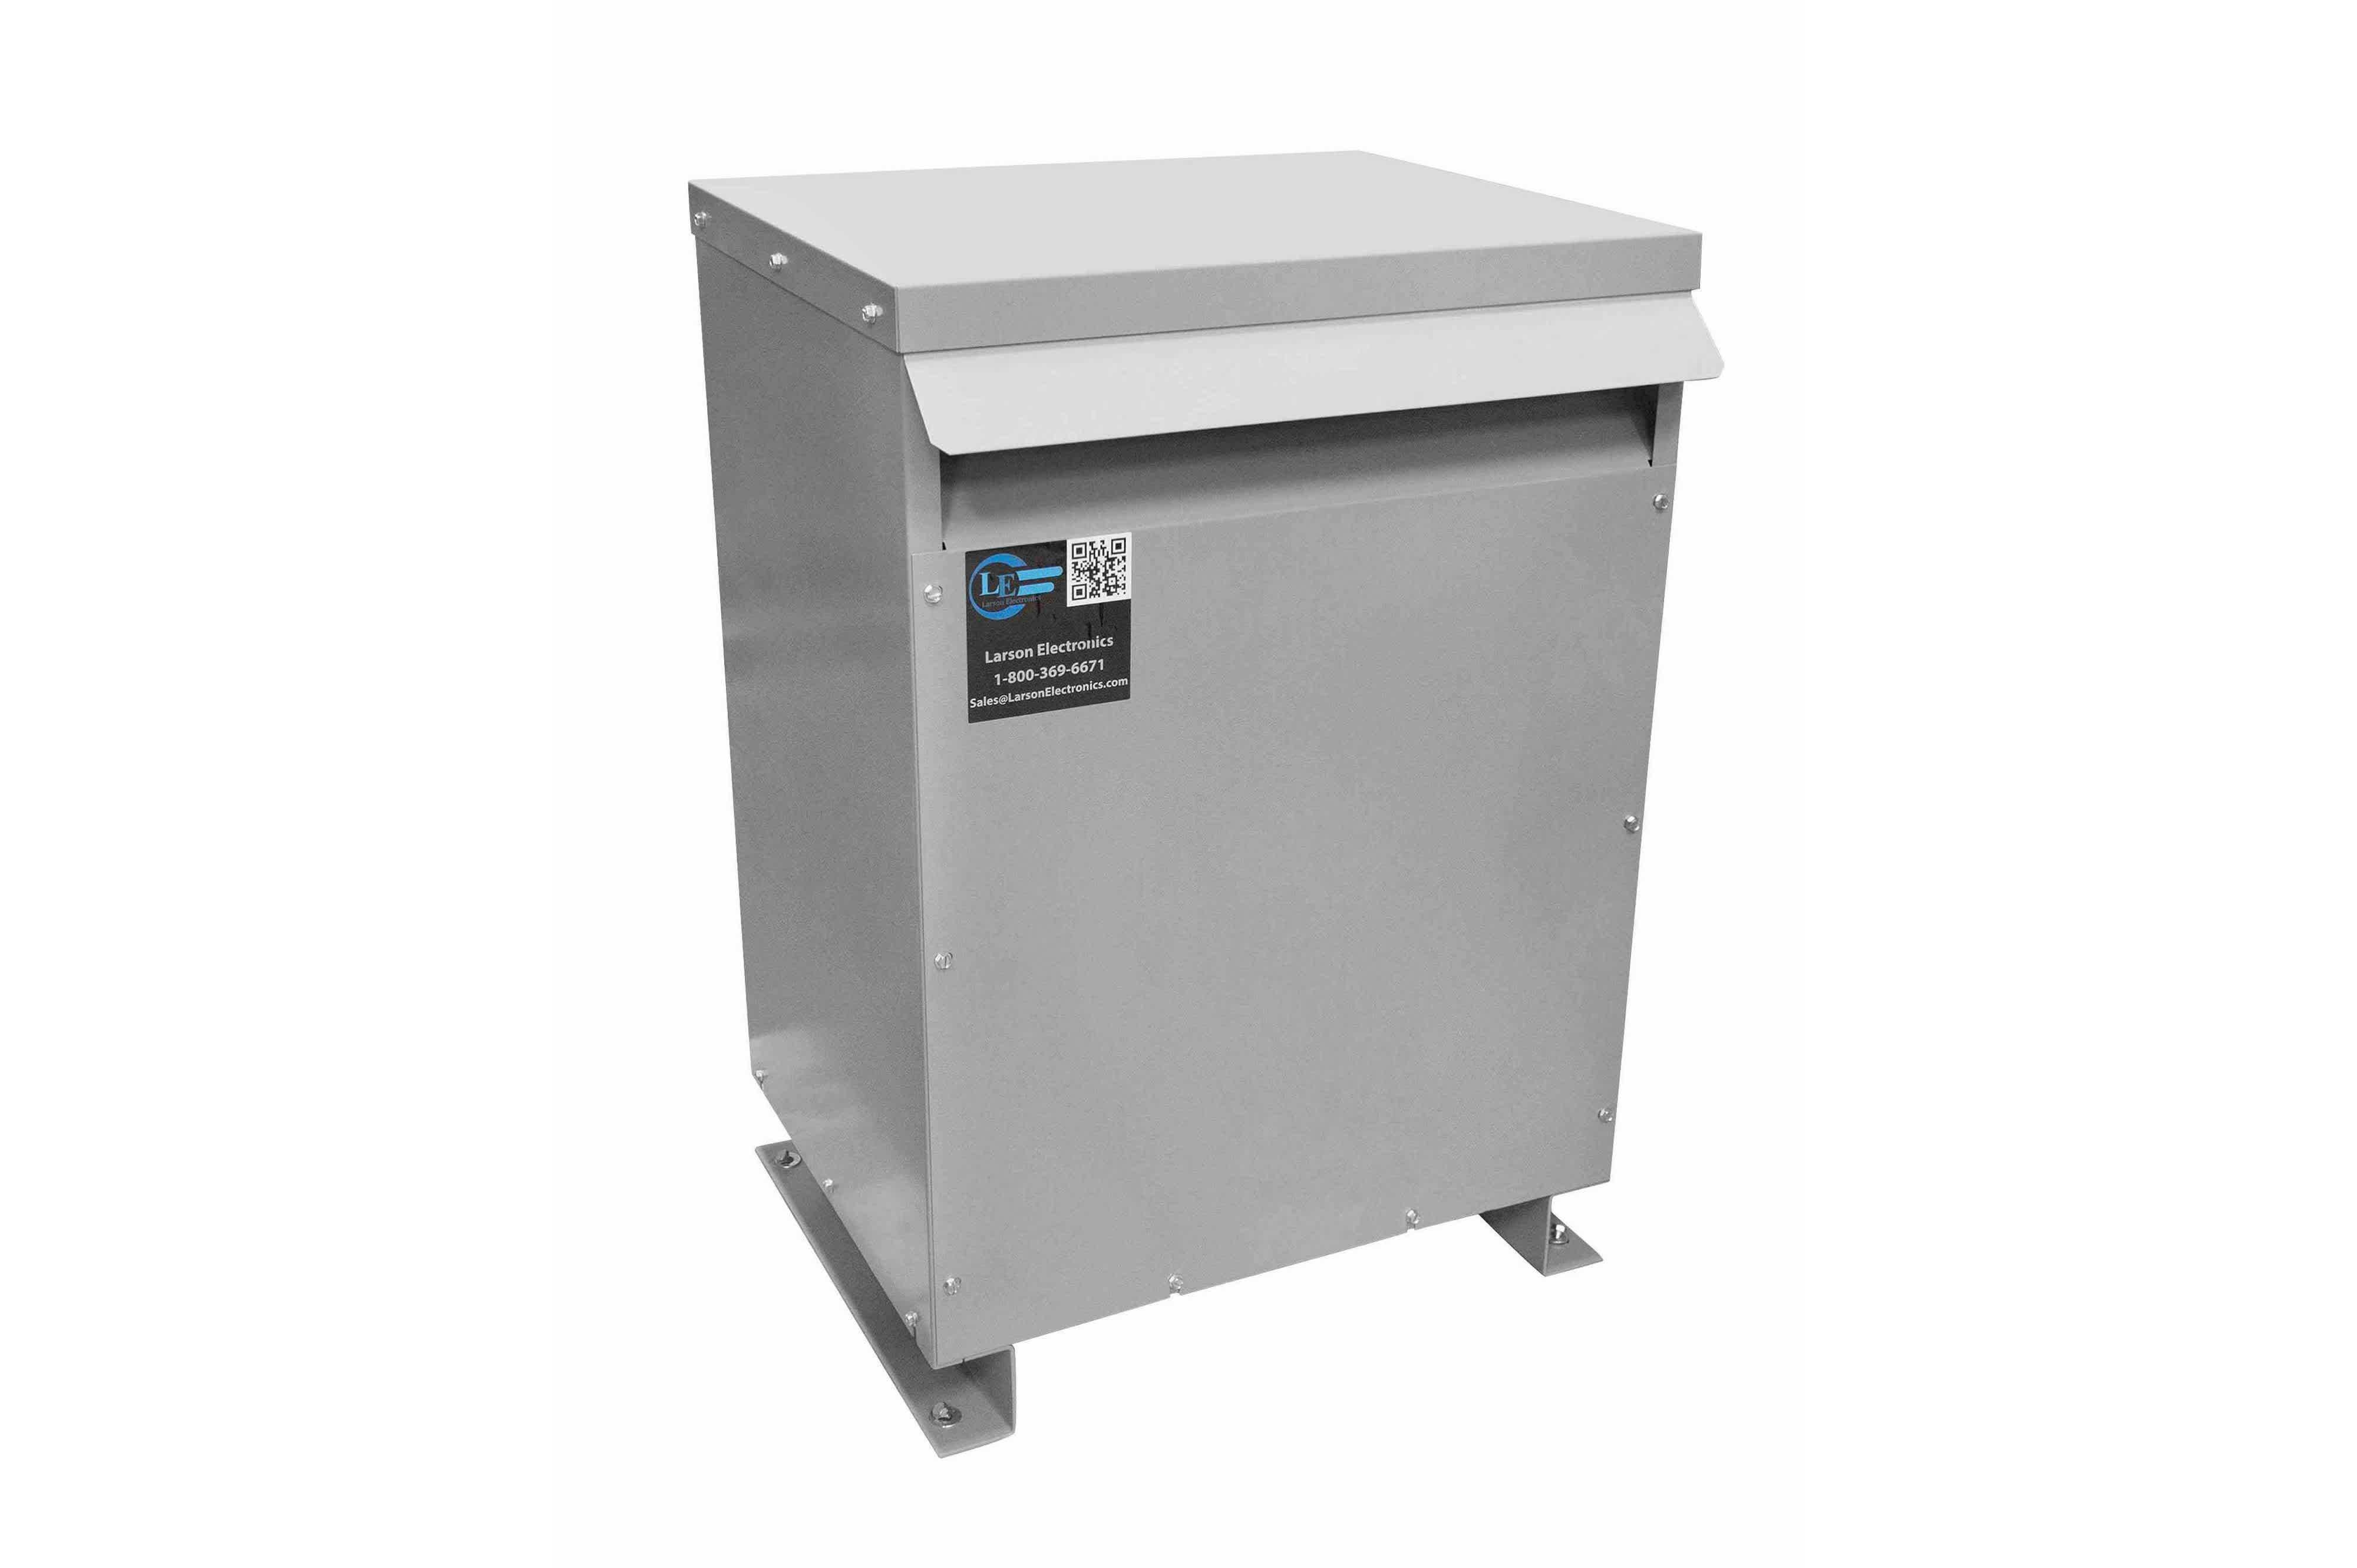 15 kVA 3PH Isolation Transformer, 208V Wye Primary, 600V Delta Secondary, N3R, Ventilated, 60 Hz